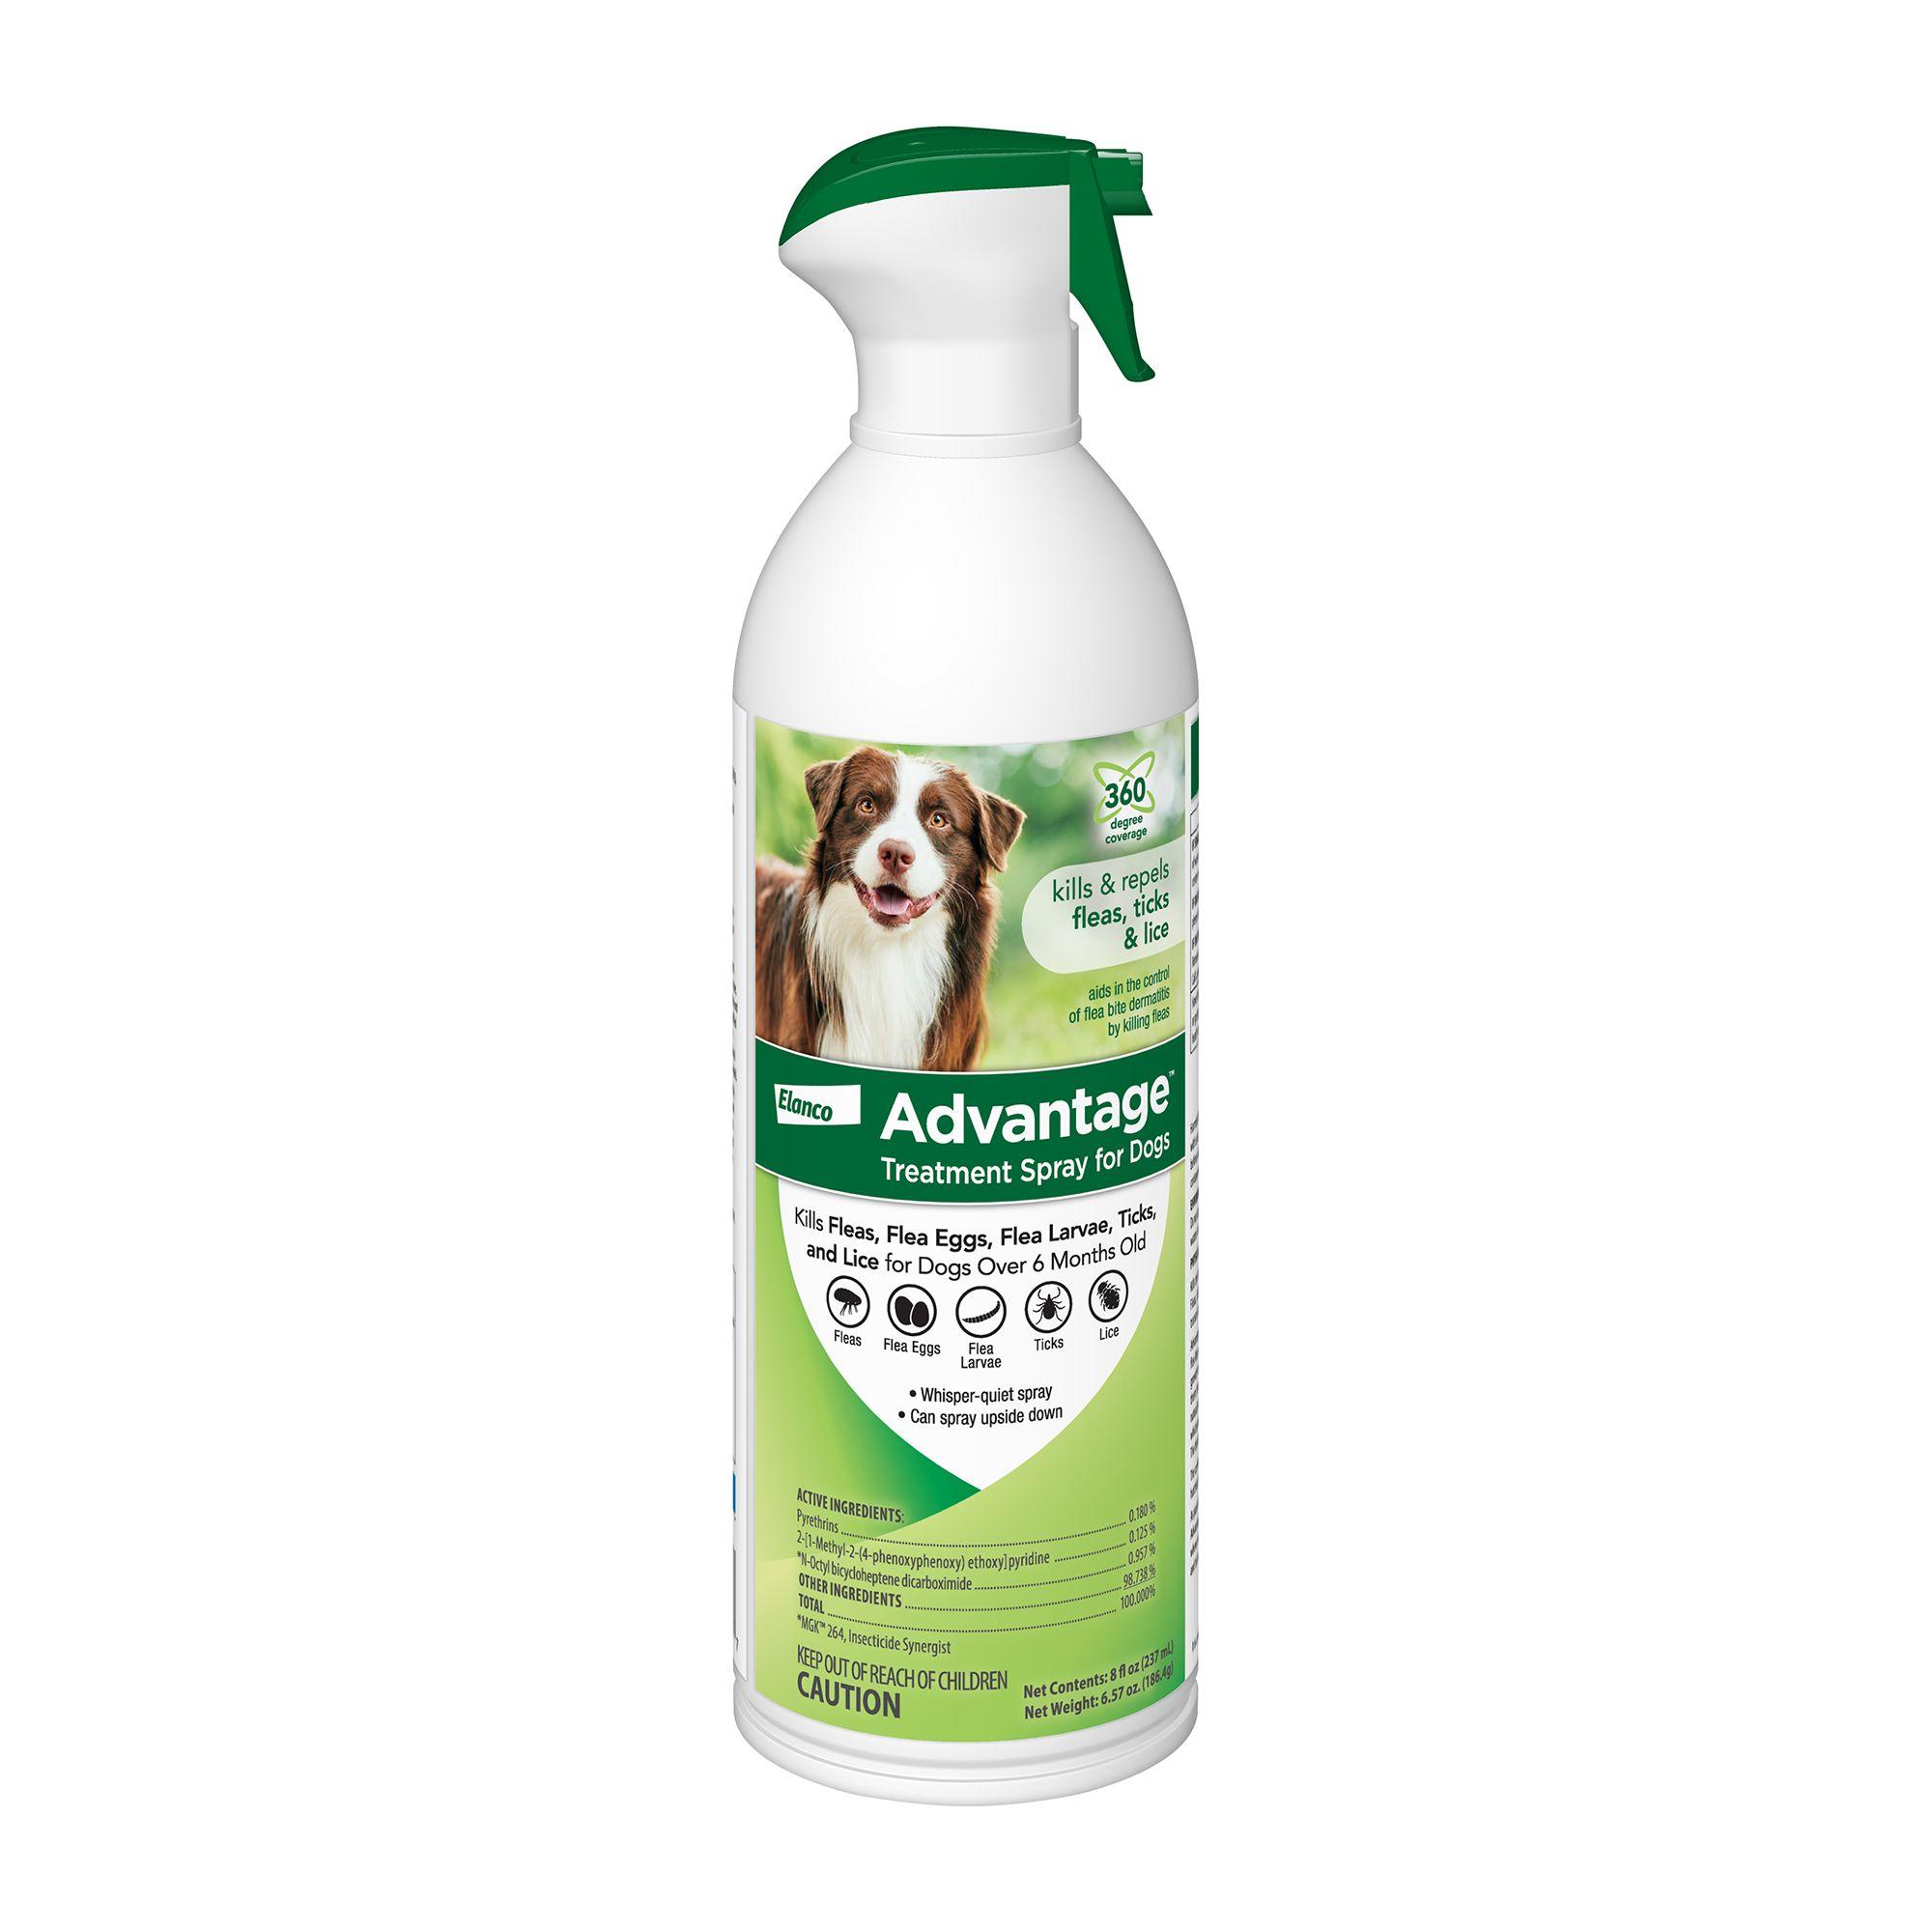 Advantage Flea And Tick Dog Treatment Spray Size 12 Fl Oz